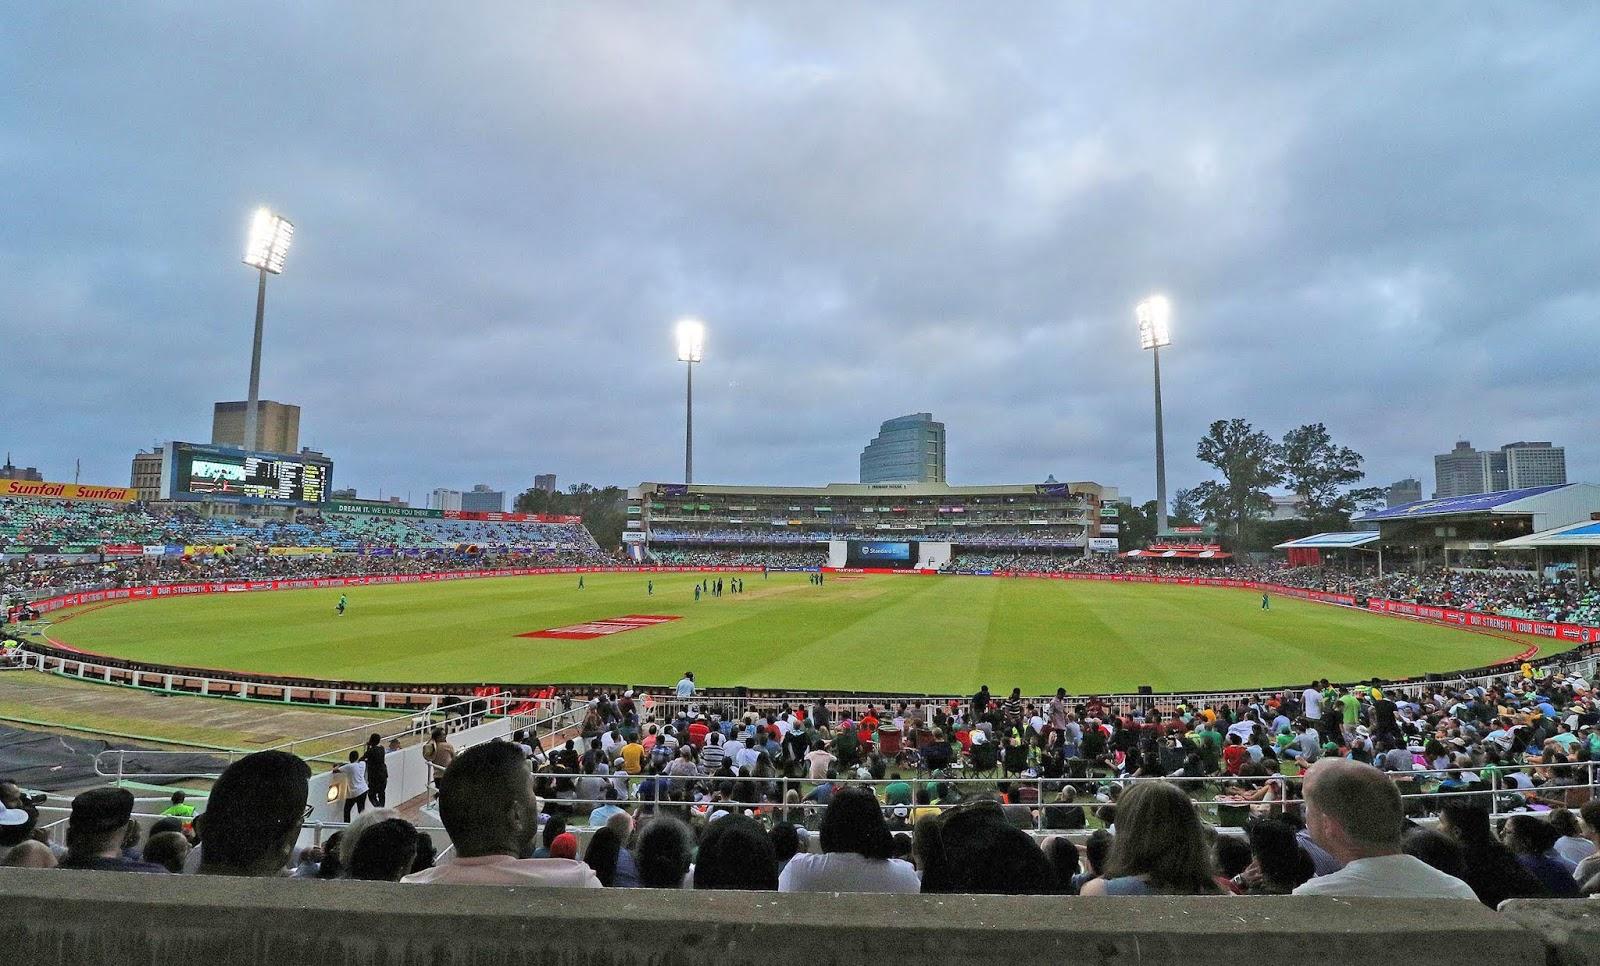 Hollywoodbets Kingsmead Stadium - Cricket Ground